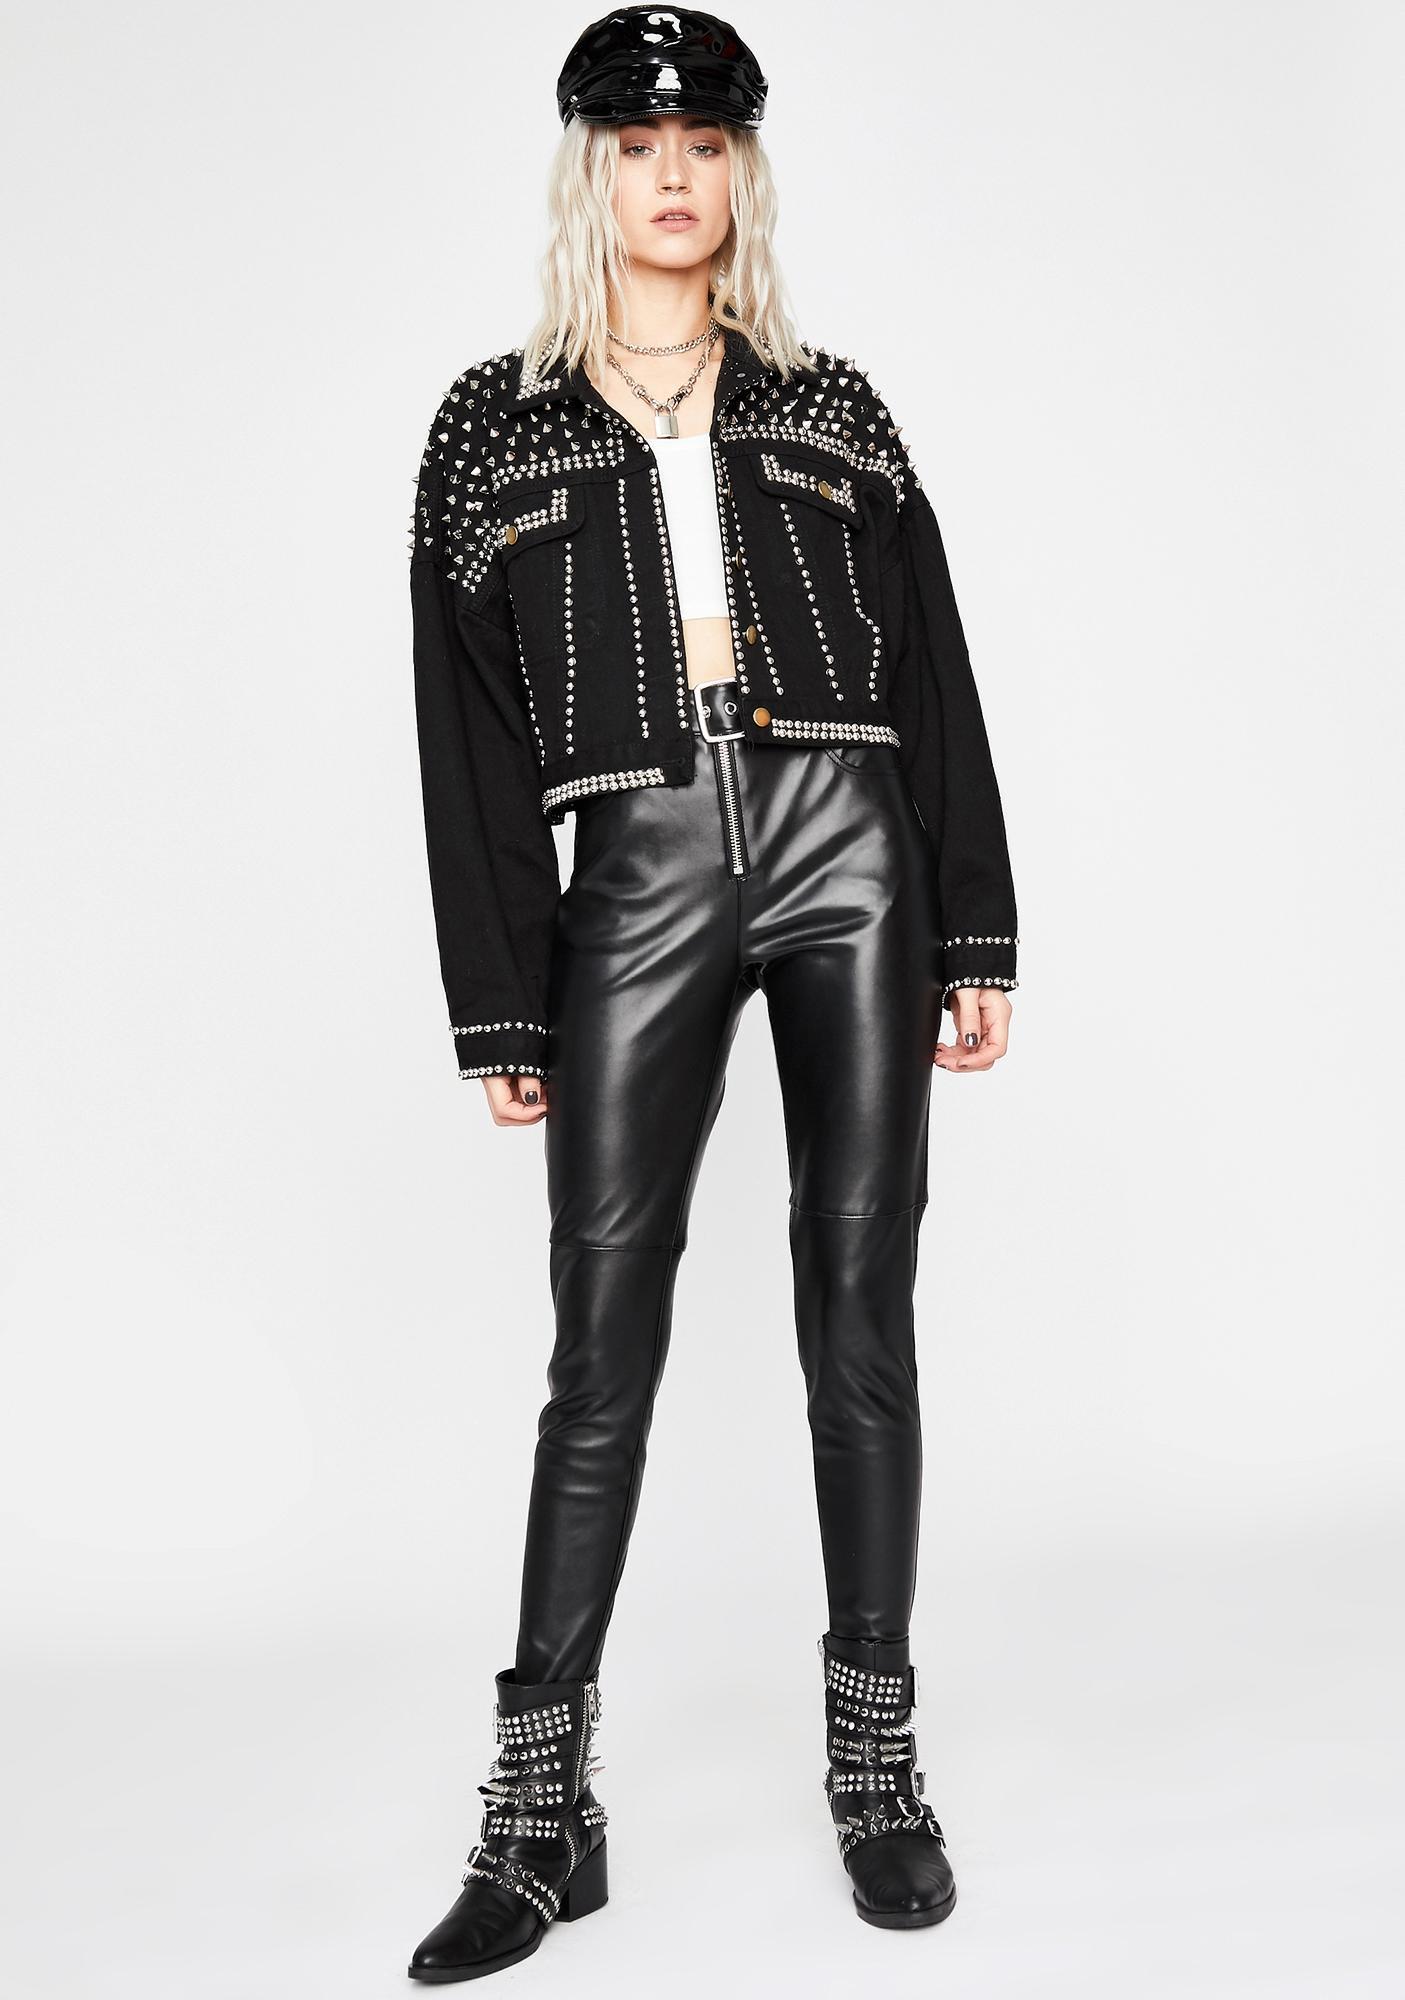 Wicked Ready To Rock Studded Jacket